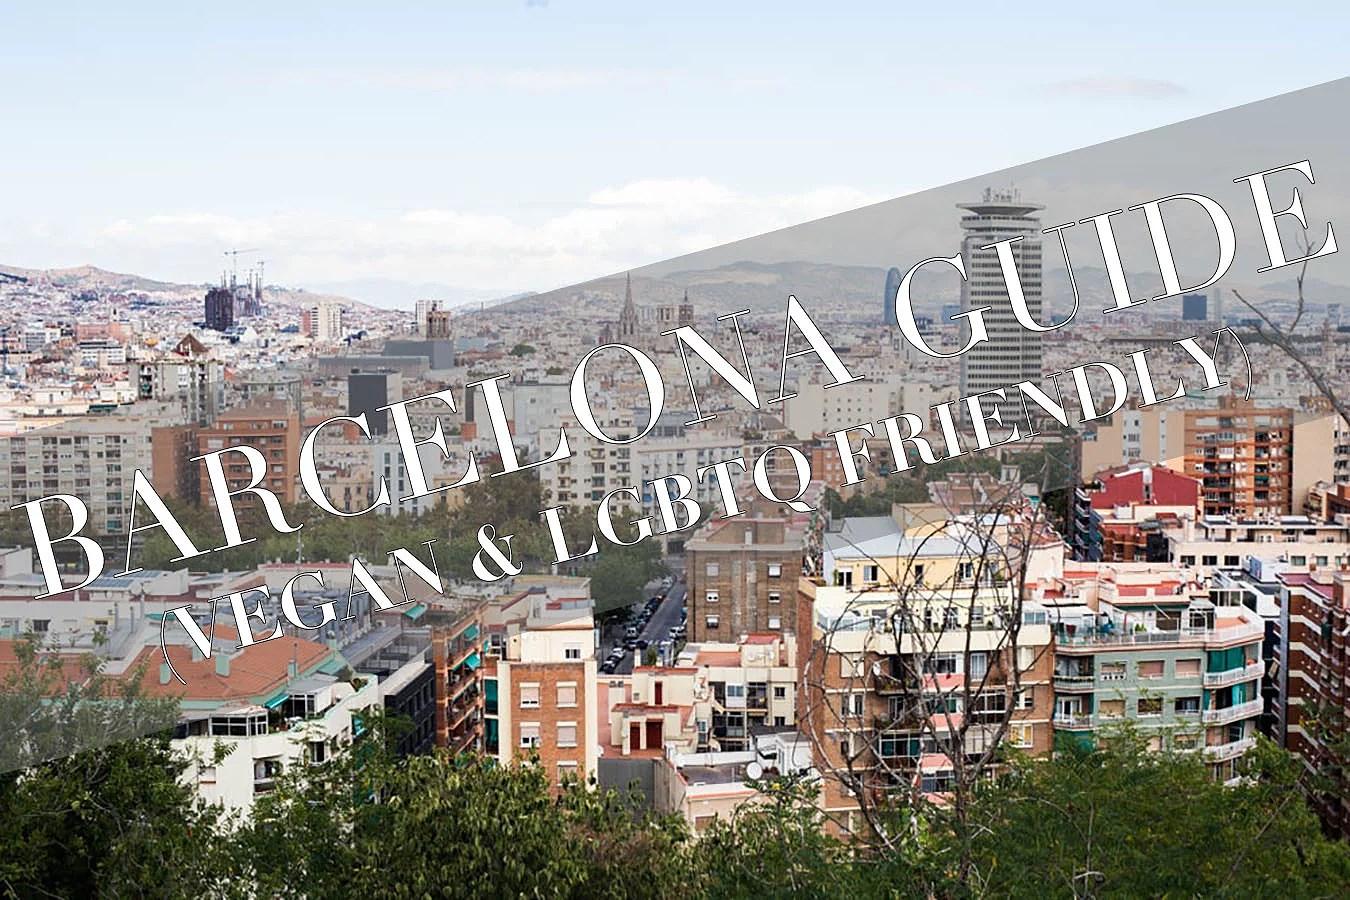 The vegan & LGBTQ friendly Barcelona guide